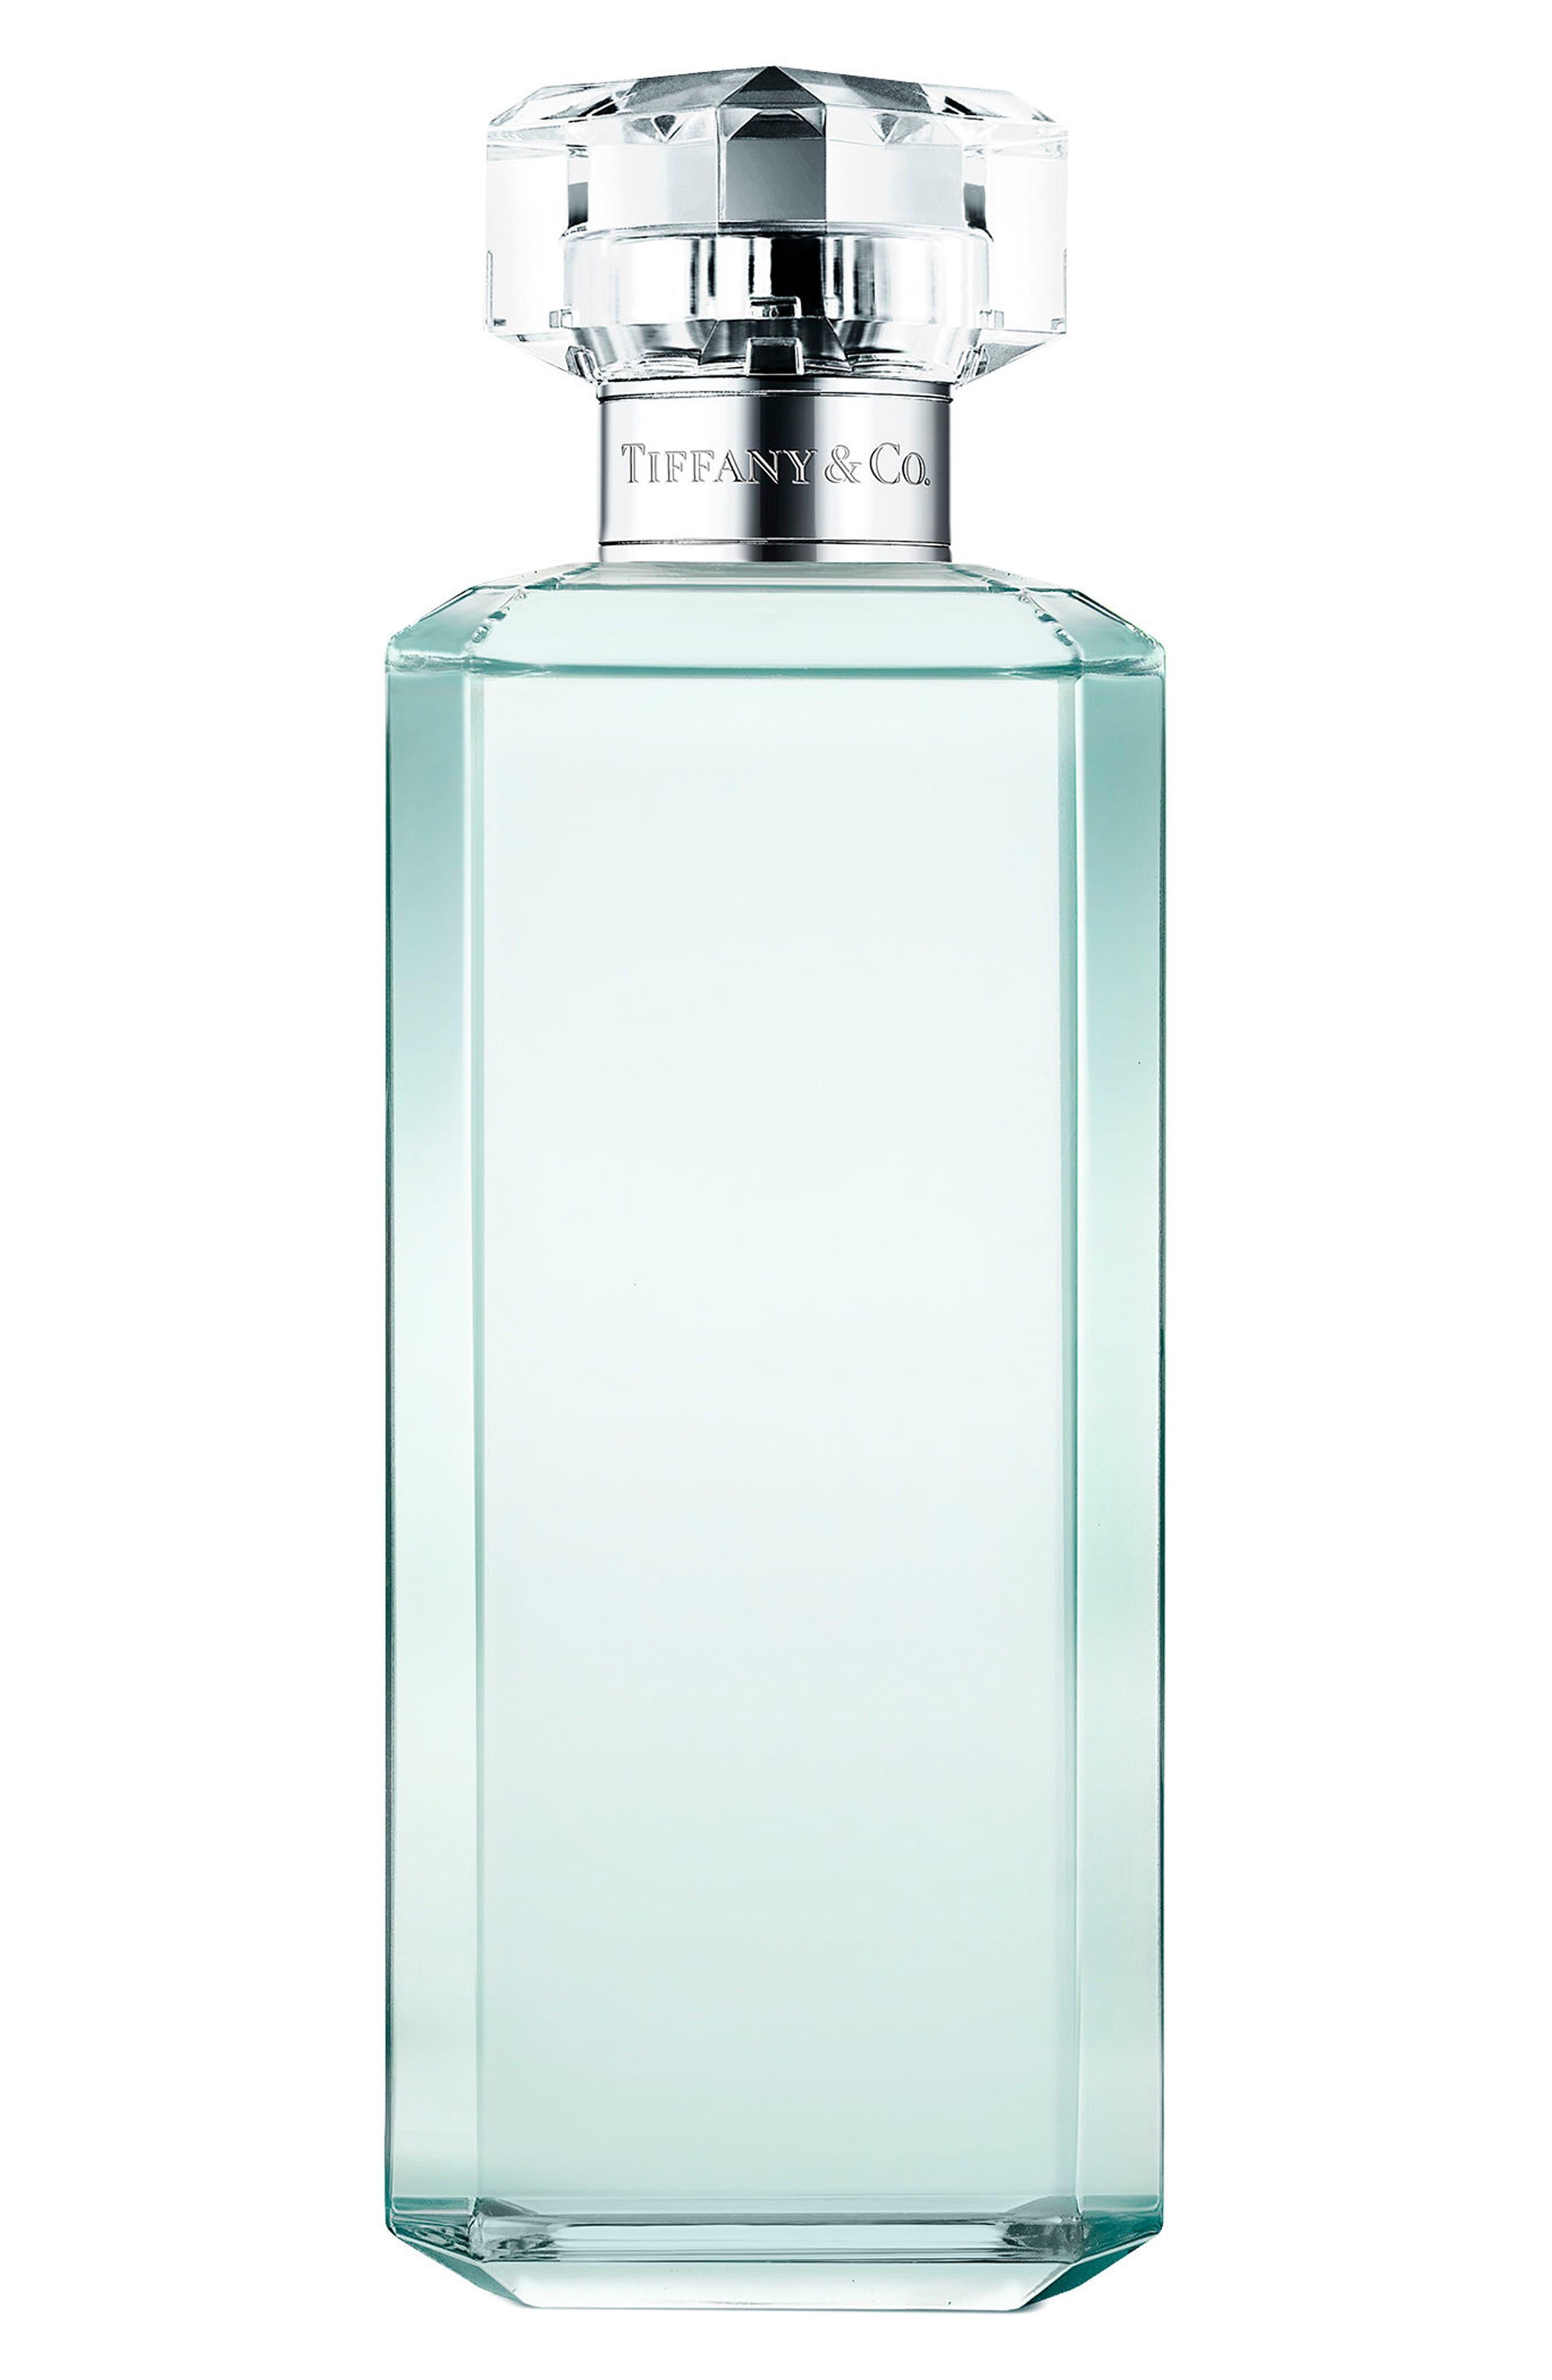 Main Image - Tiffany & Co. Tiffany Perfumed Shower Gel